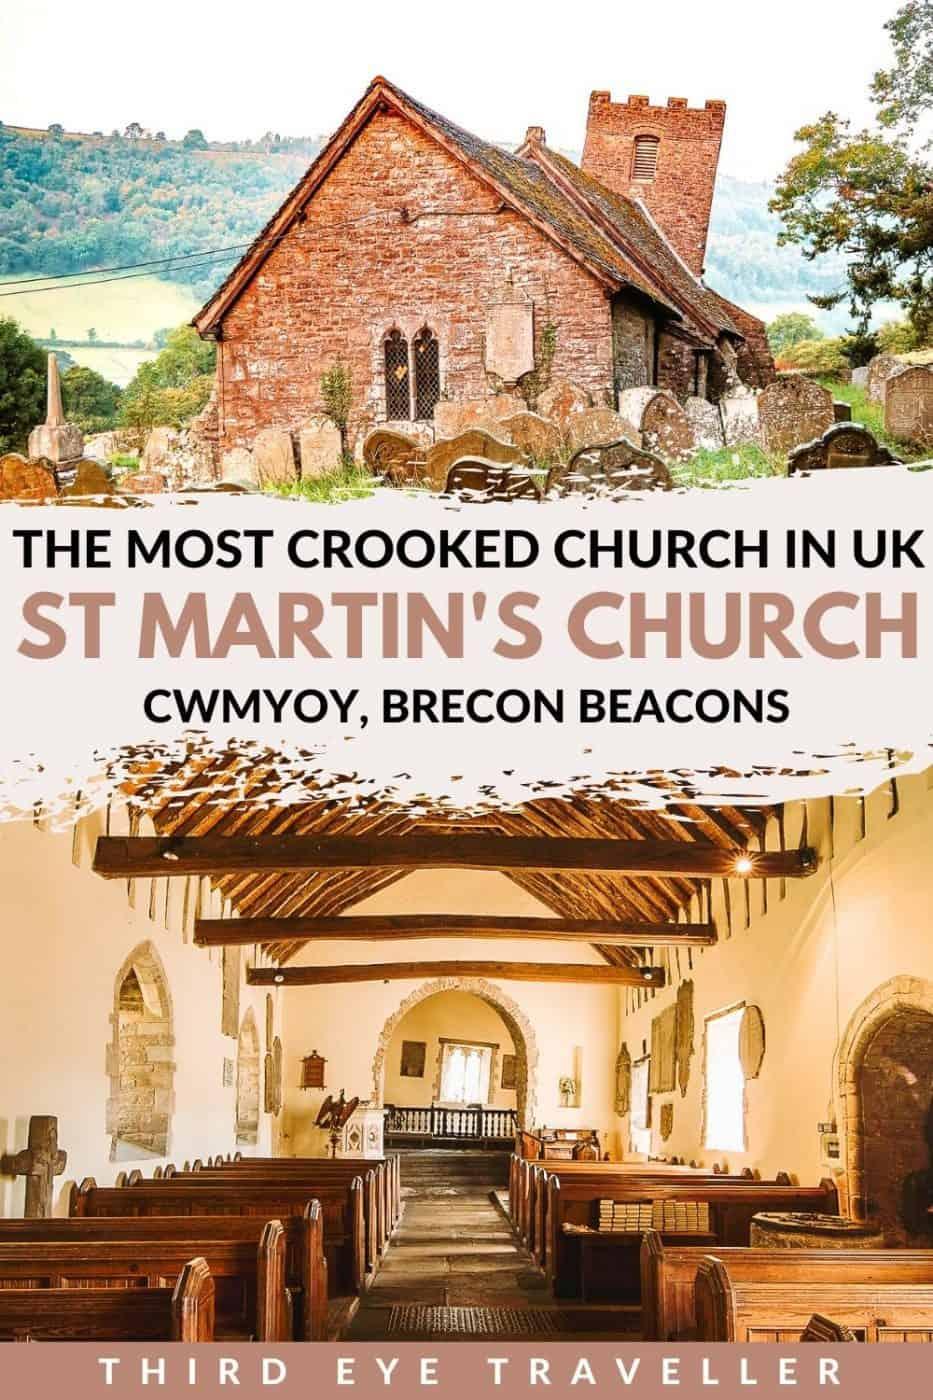 St Martin's Church Cwmyoy Crooked Church in Britain